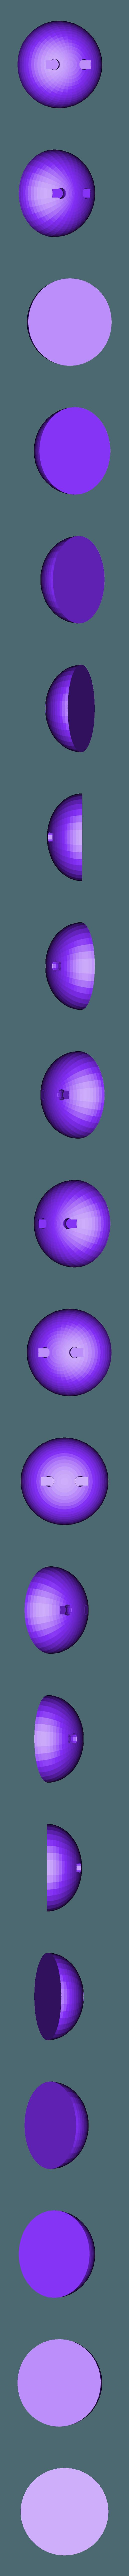 UFO_Keychain_v1.3_p2_green.stl Download free STL file UFO Keychains! • 3D printer design, MakerMathieu